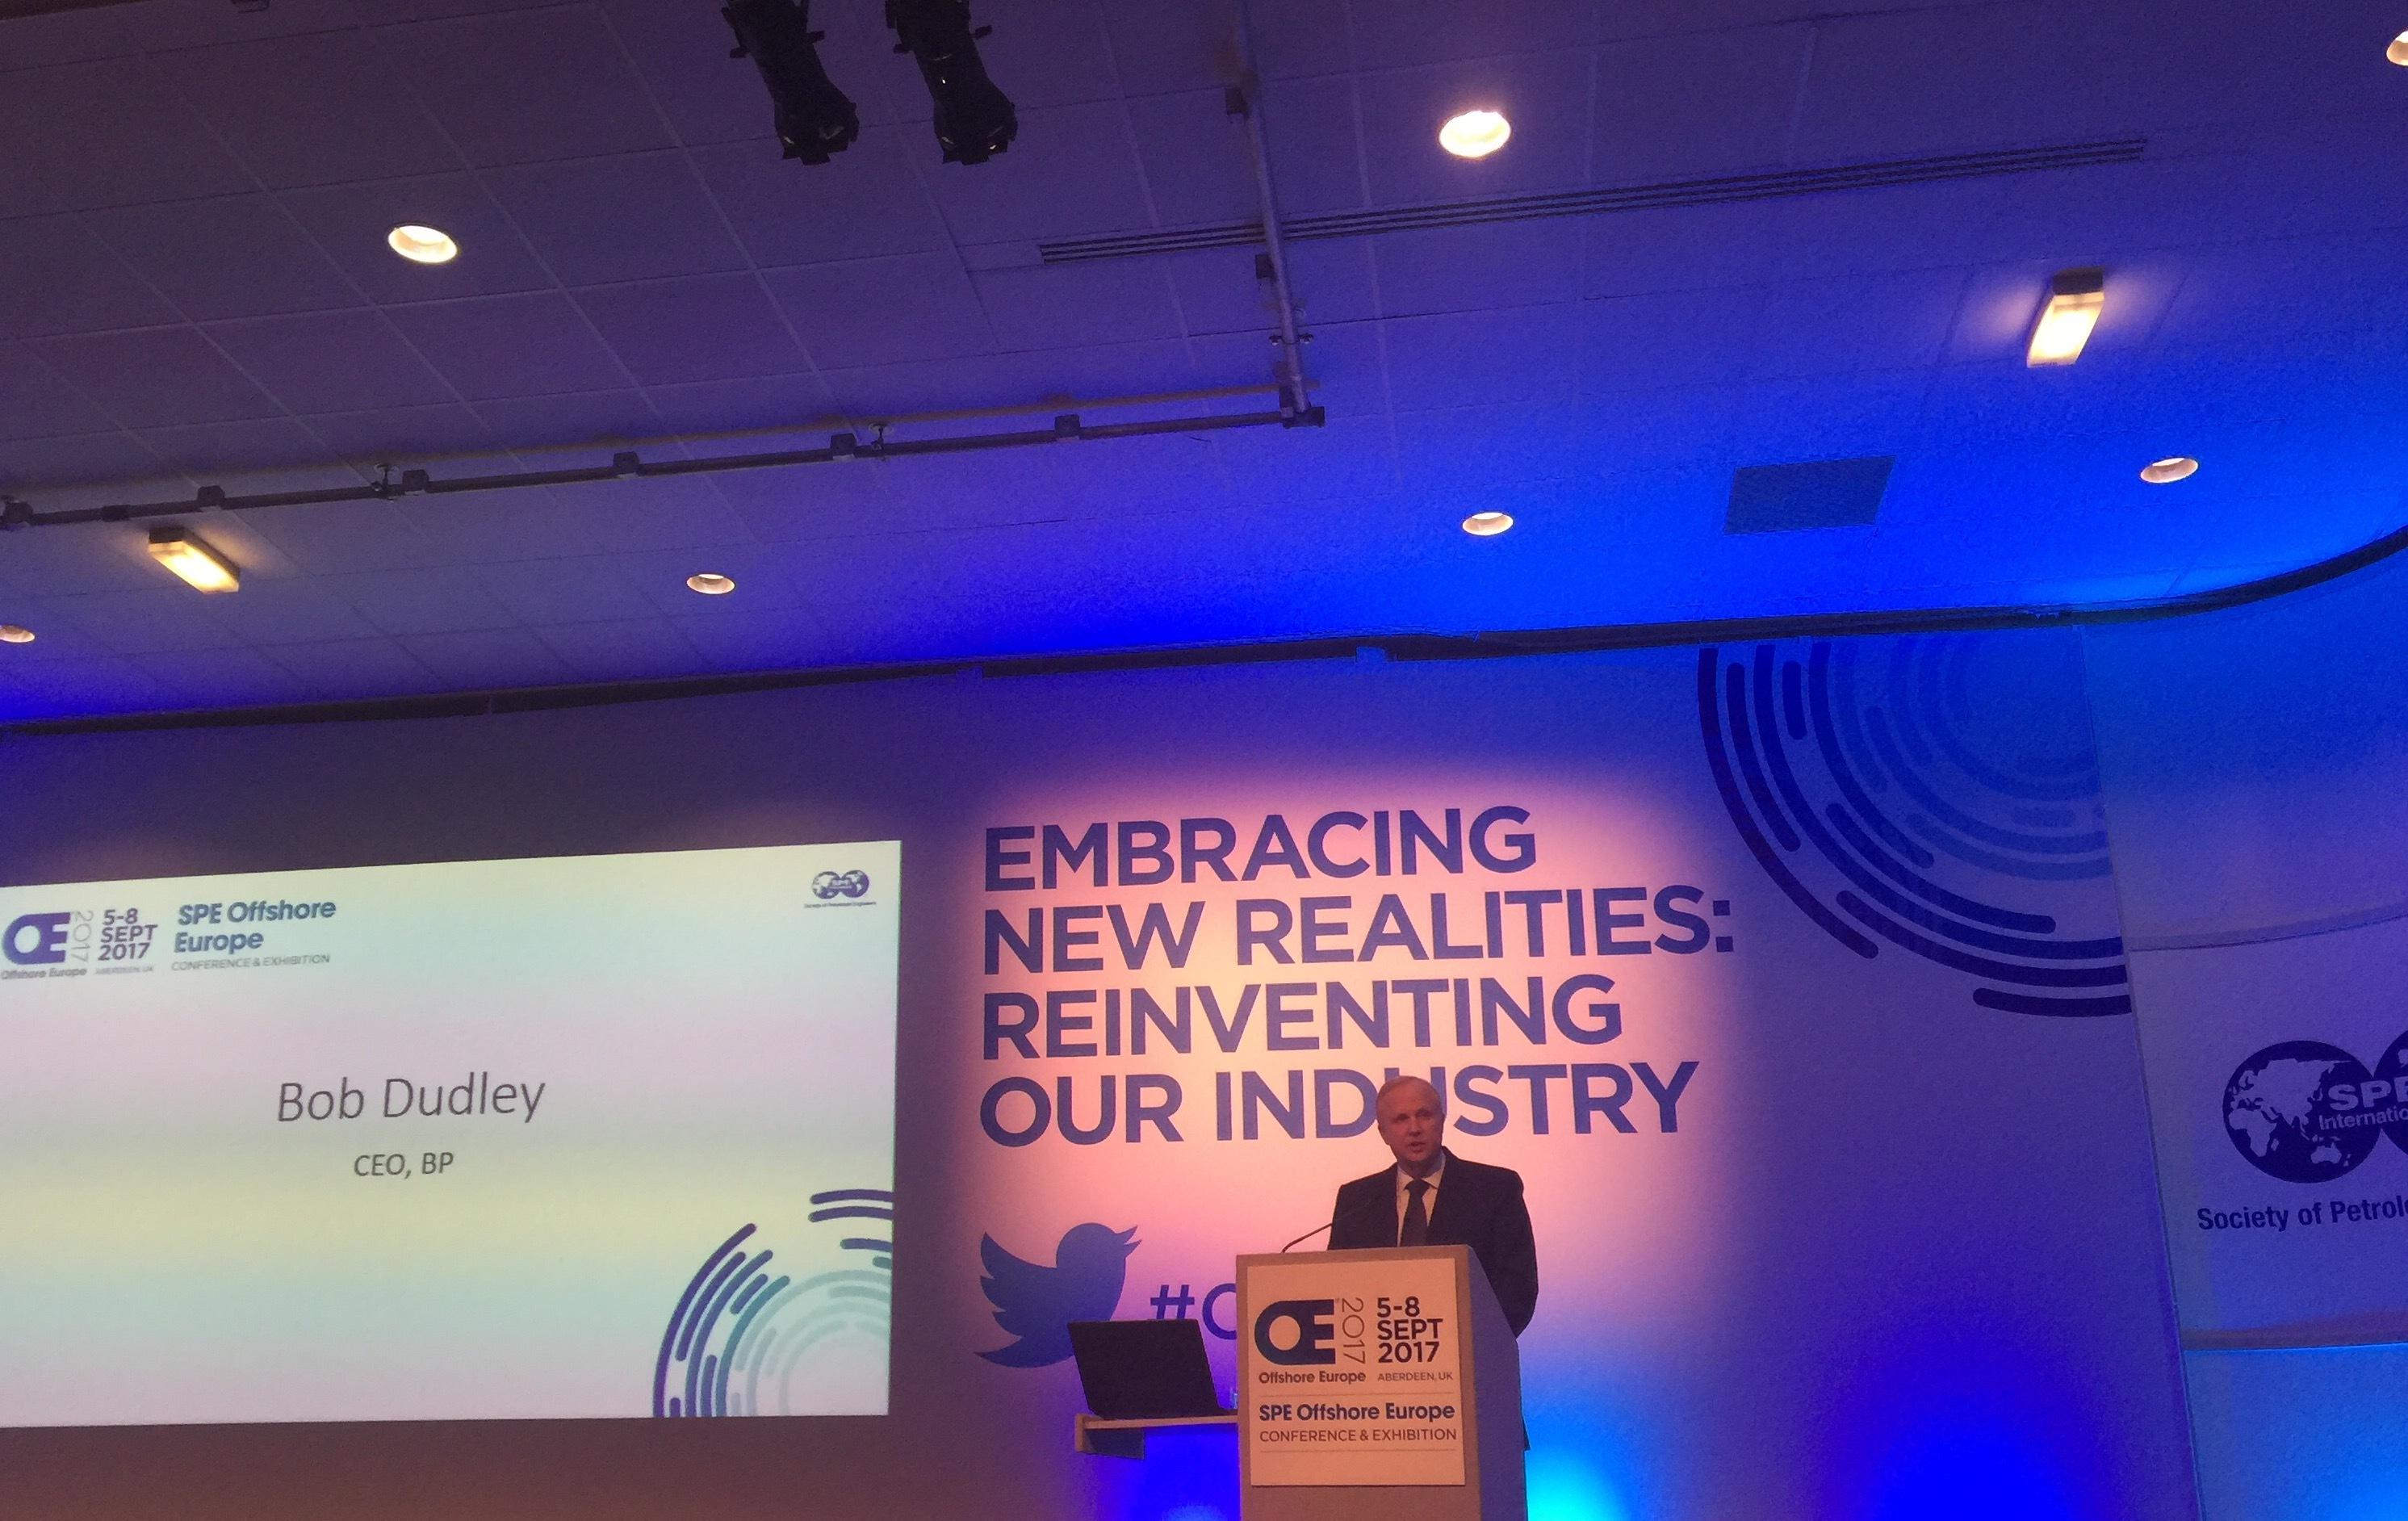 BP's Bob Dudley addressing Offshore Europe